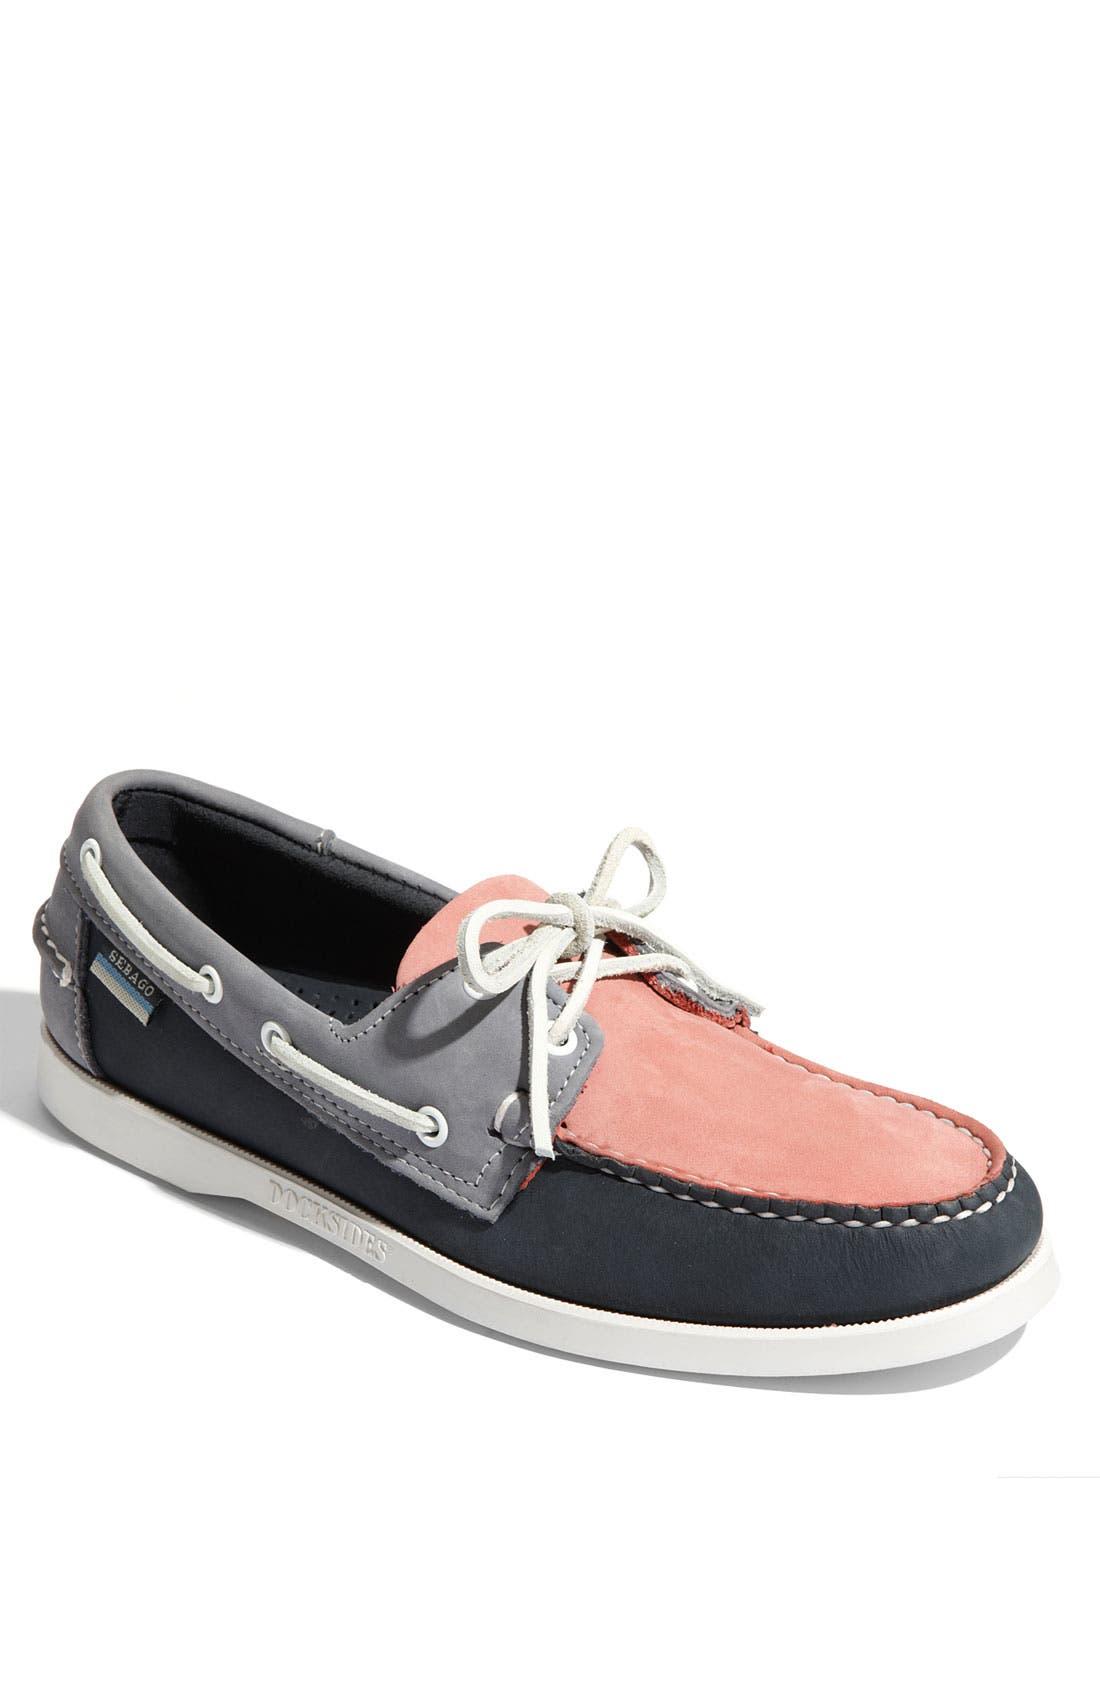 Main Image - Sebago 'Spinnaker' Boat Shoe (Men)